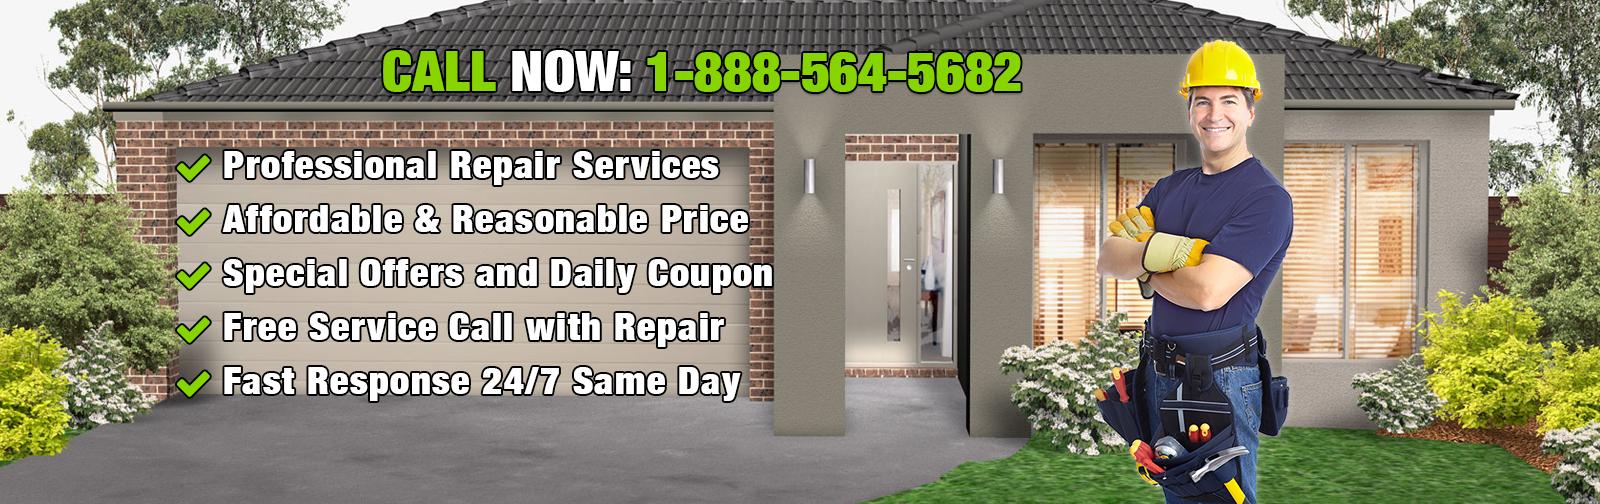 Beau AAA Garage Door Repair Pearland | 281 628 2691